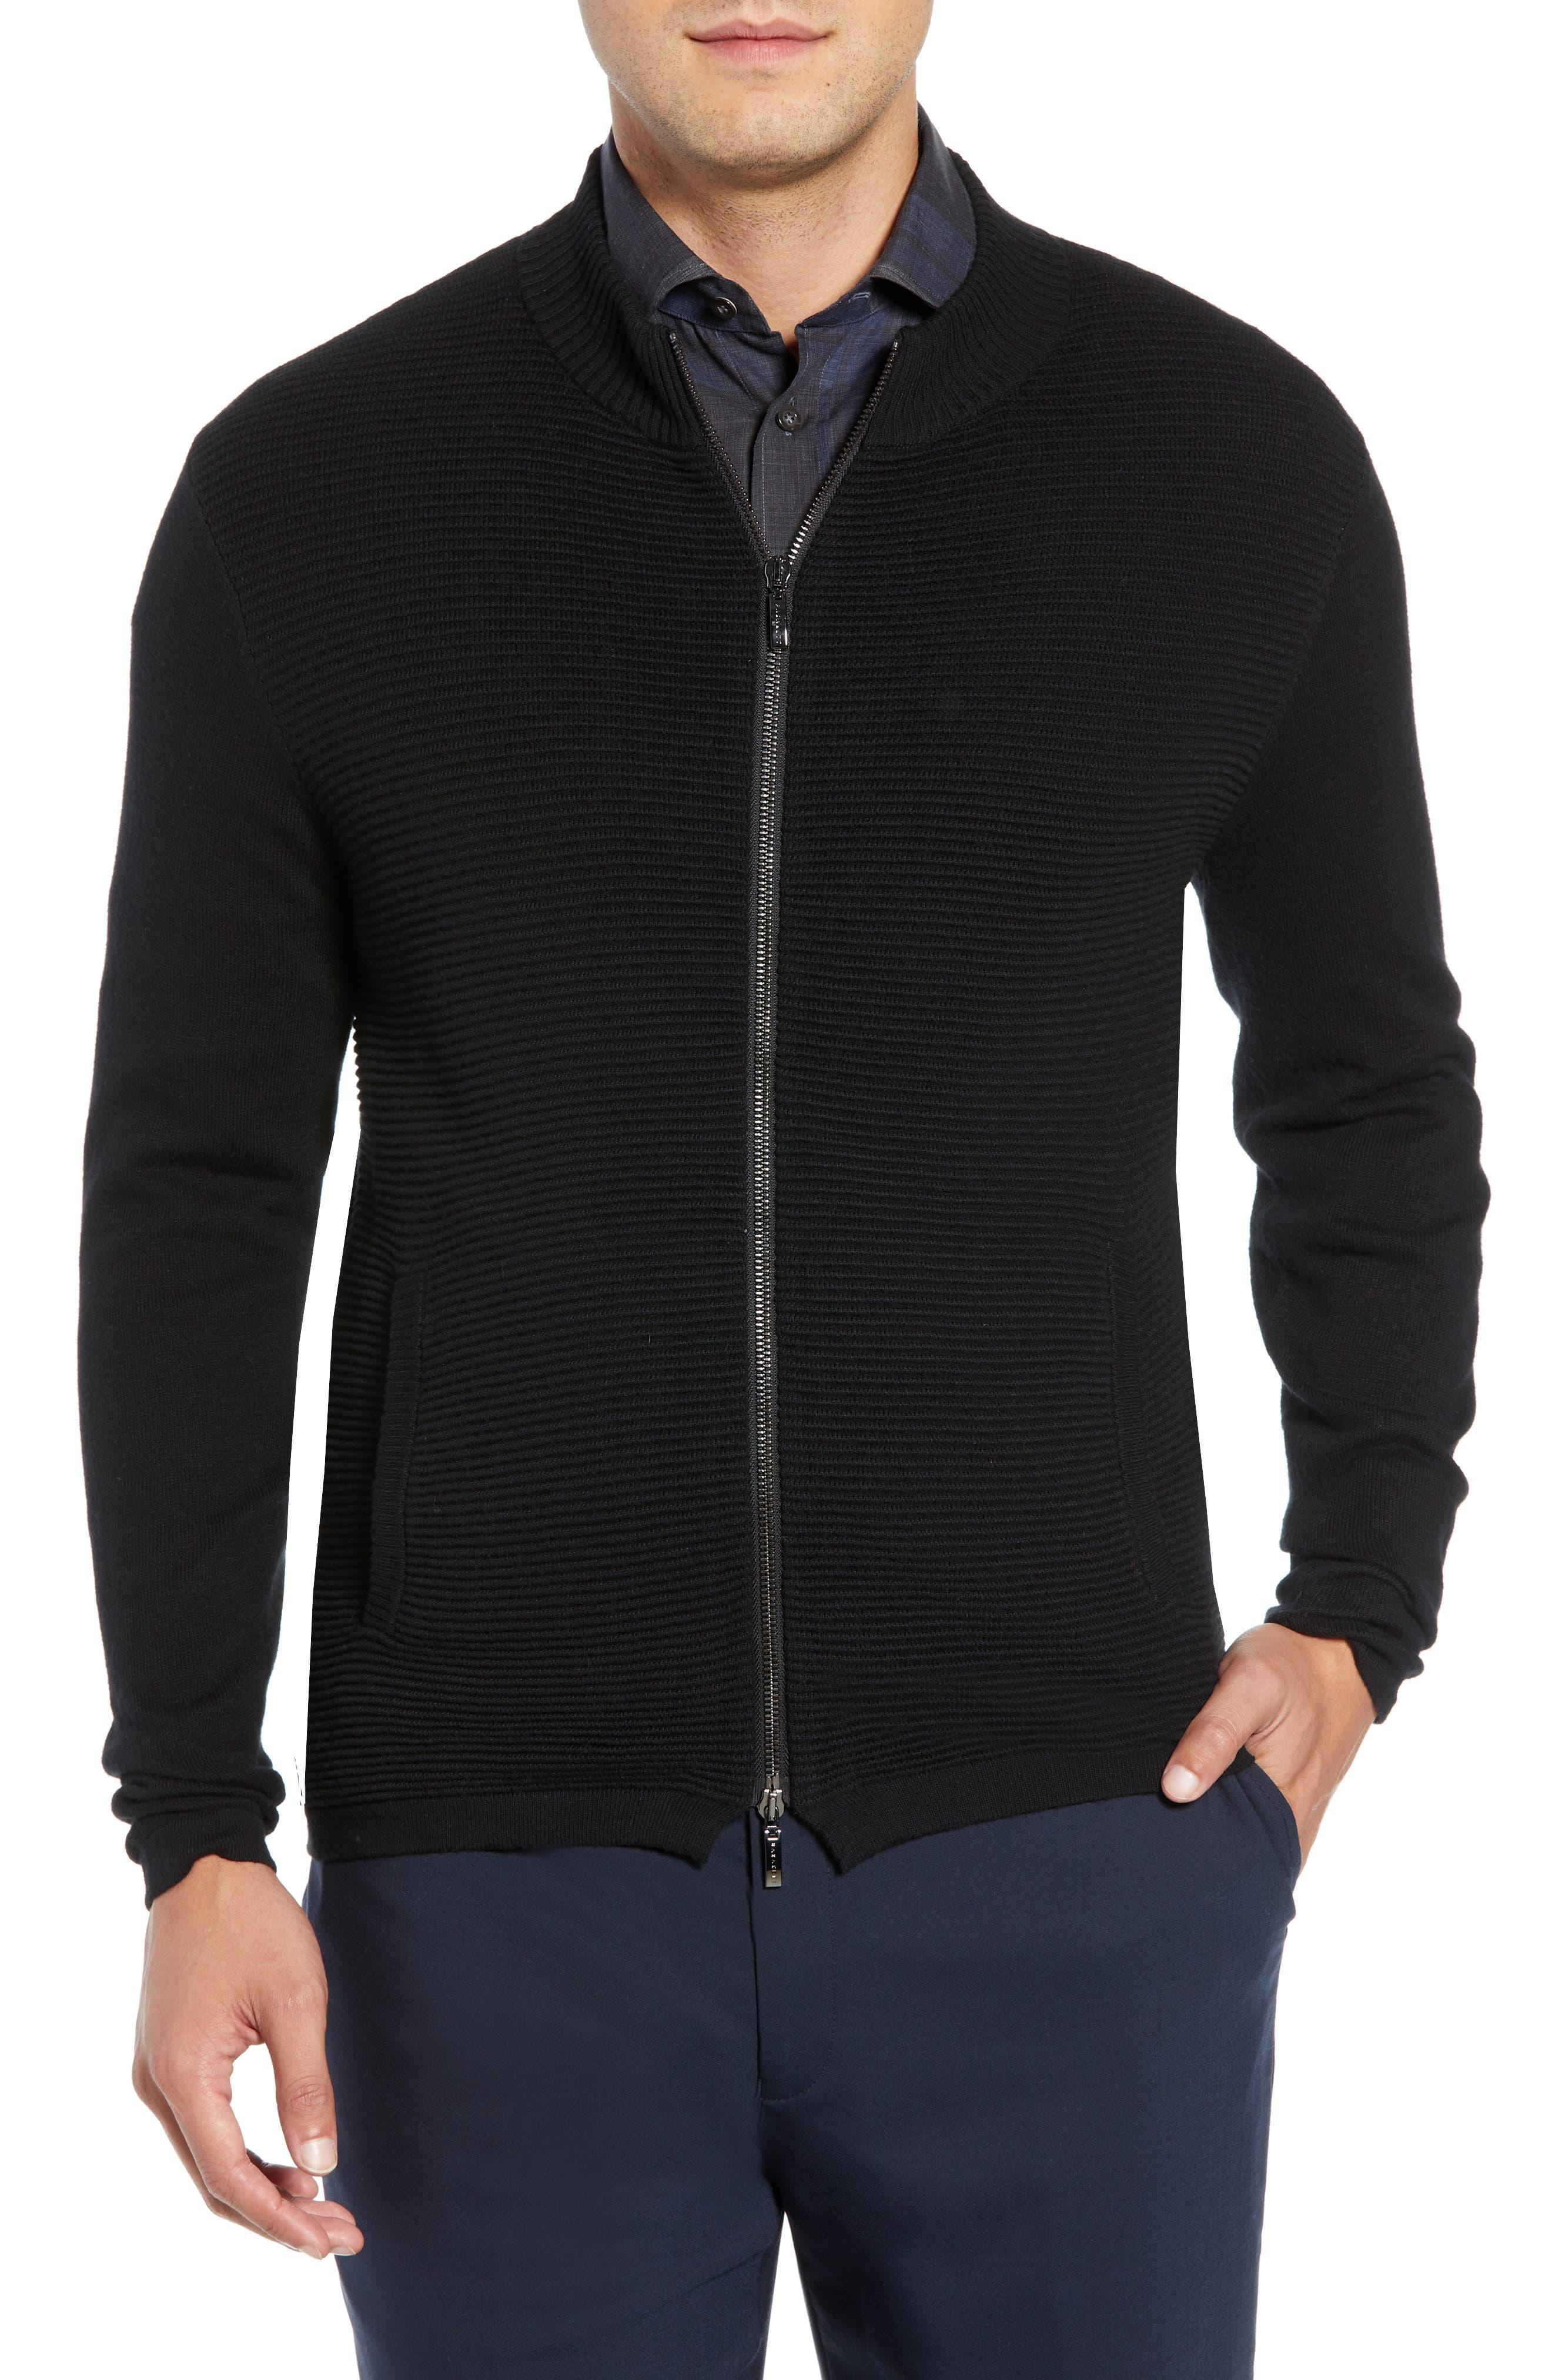 Yorkville Zip Sweater,                             Main thumbnail 1, color,                             BLACK